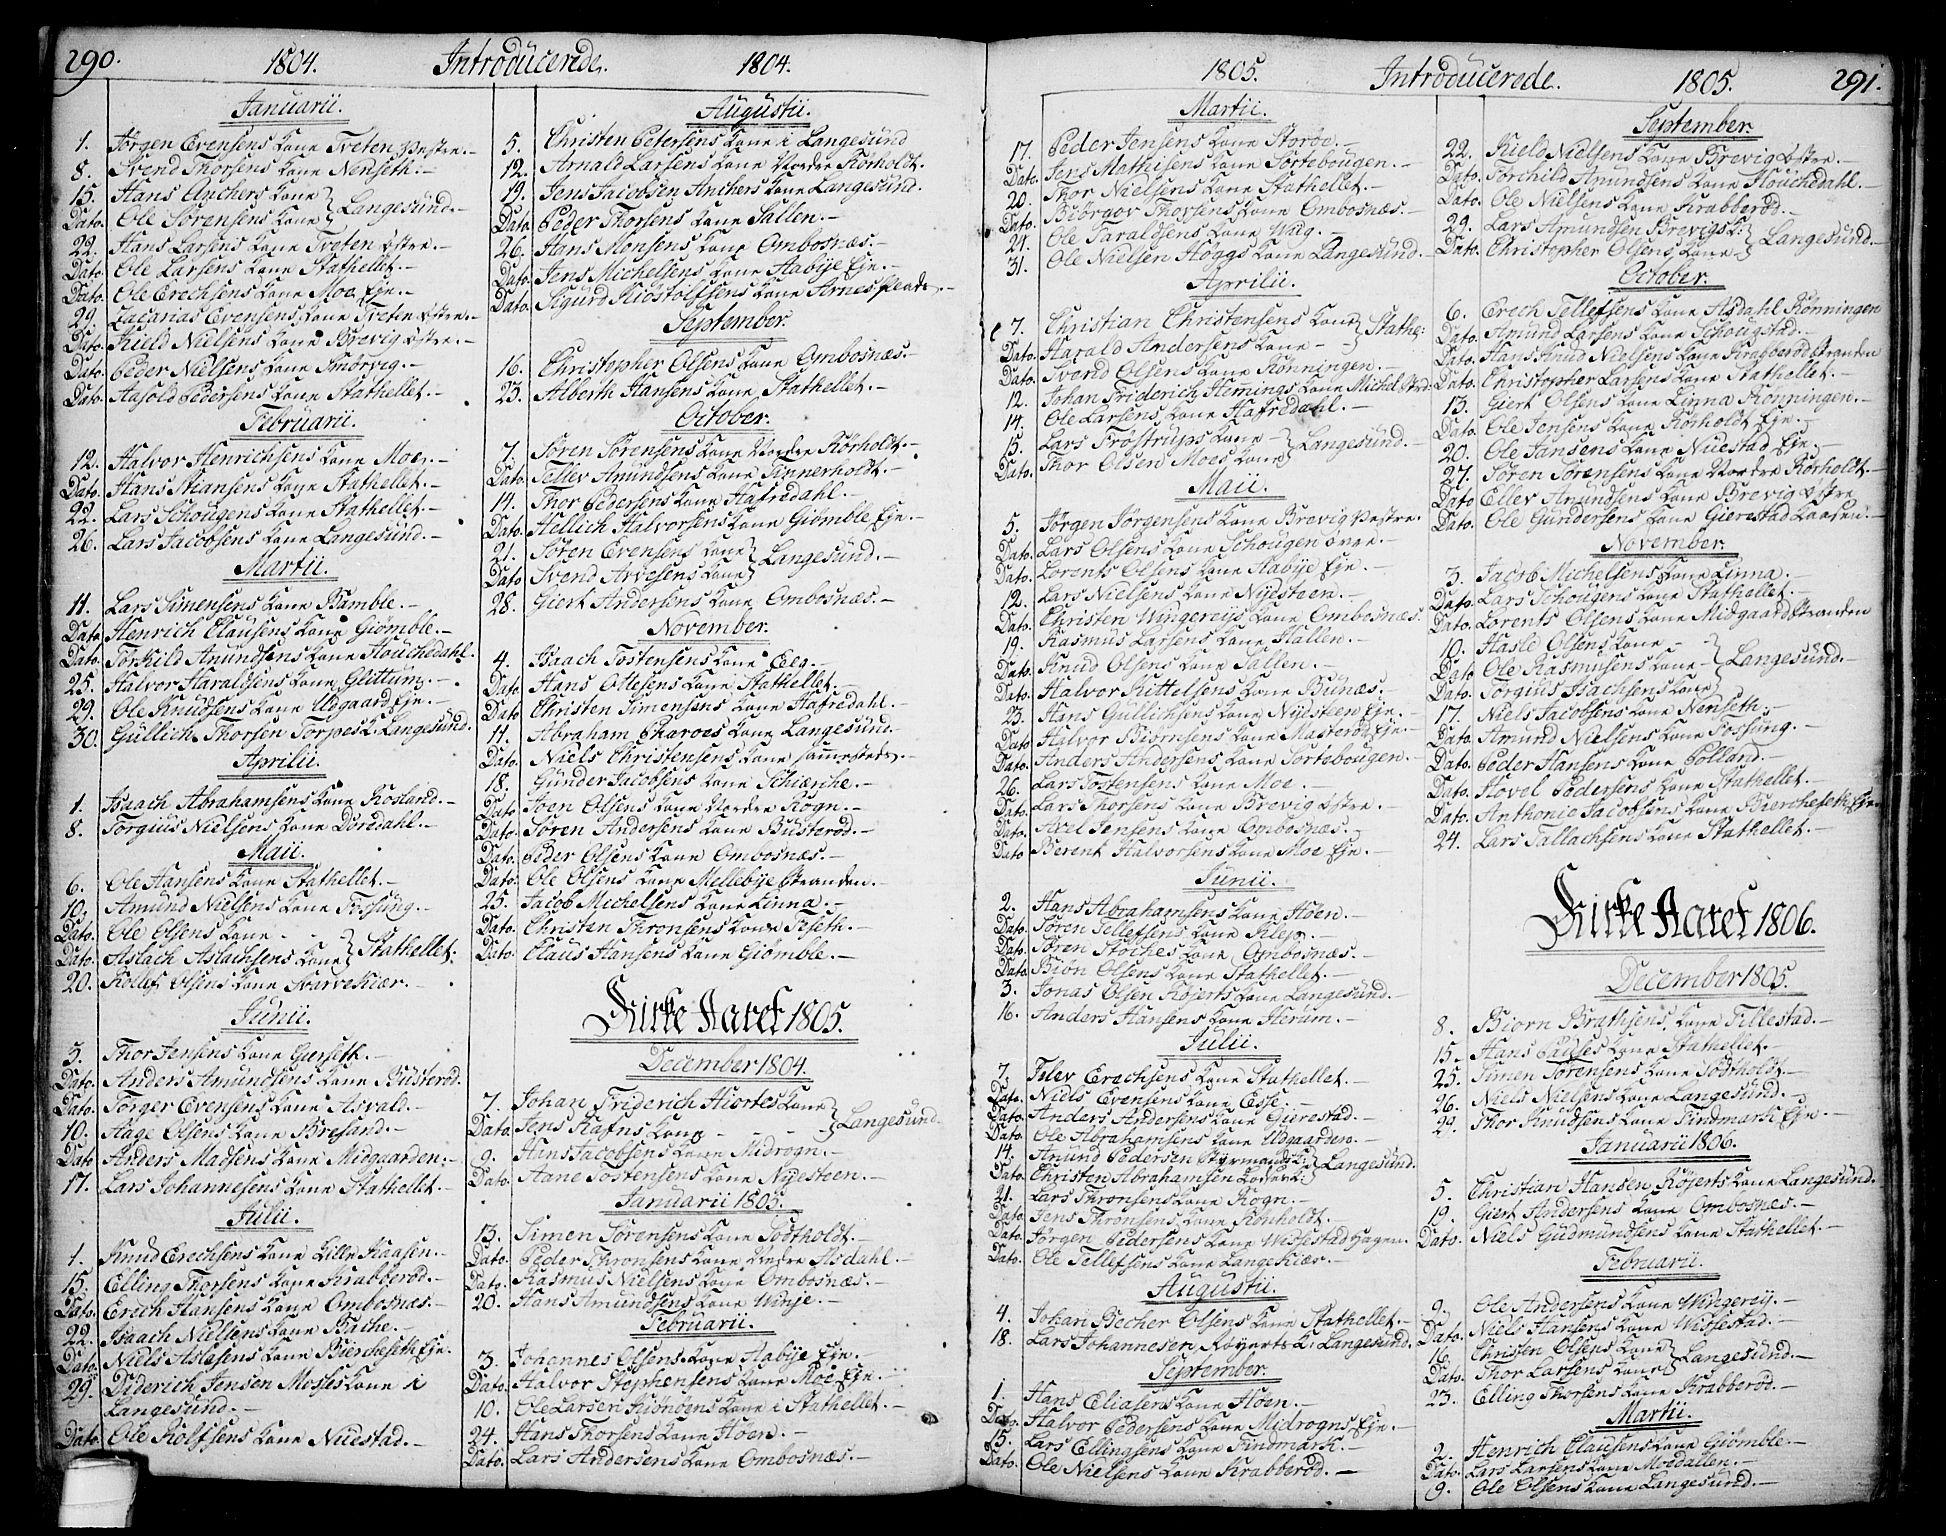 SAKO, Bamble kirkebøker, F/Fa/L0002: Ministerialbok nr. I 2, 1775-1814, s. 290-291